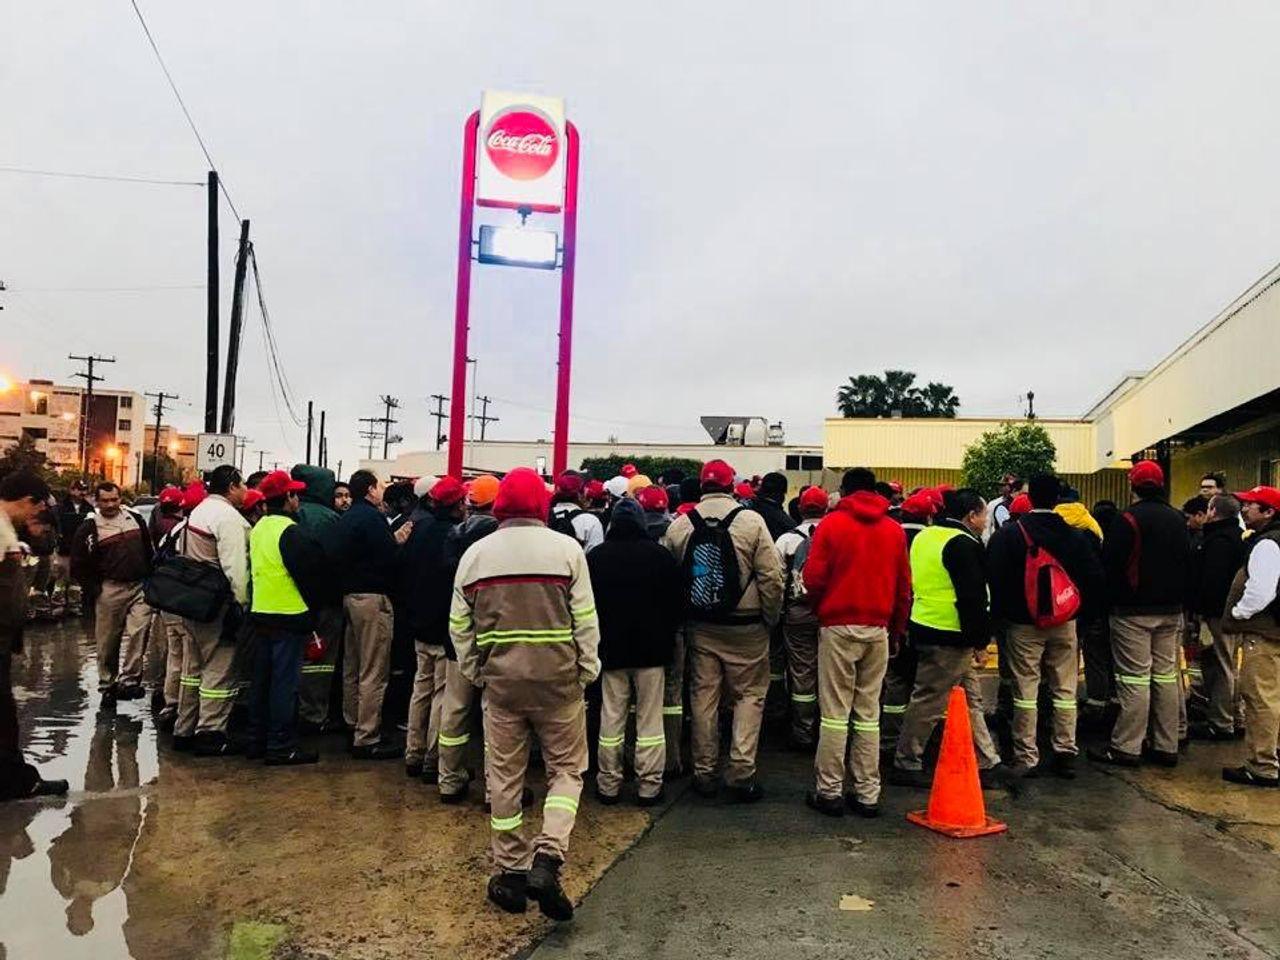 Matamoros Coca-Cola workers on strike